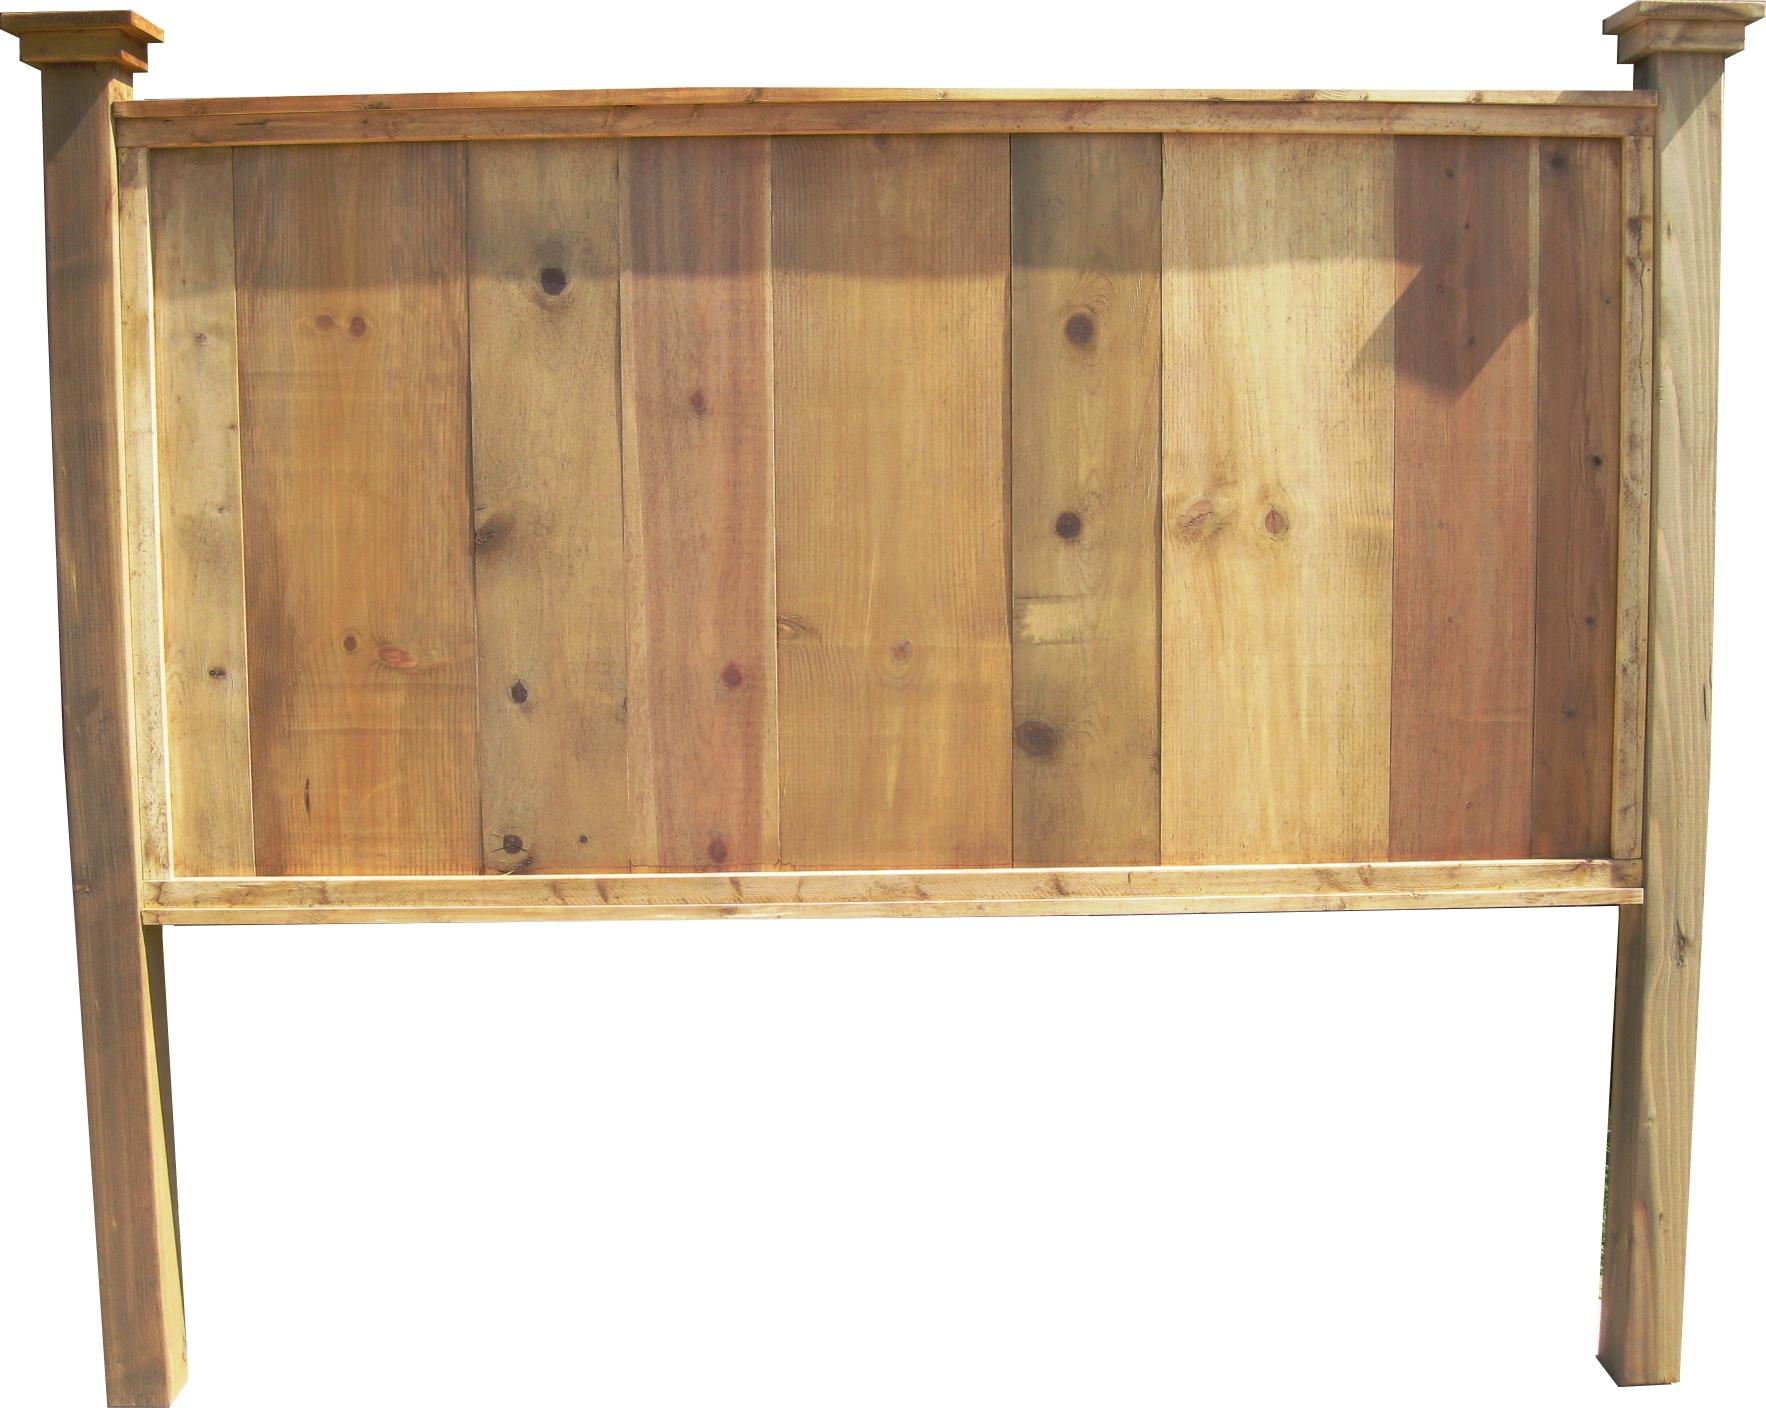 Wood Headboard Pics